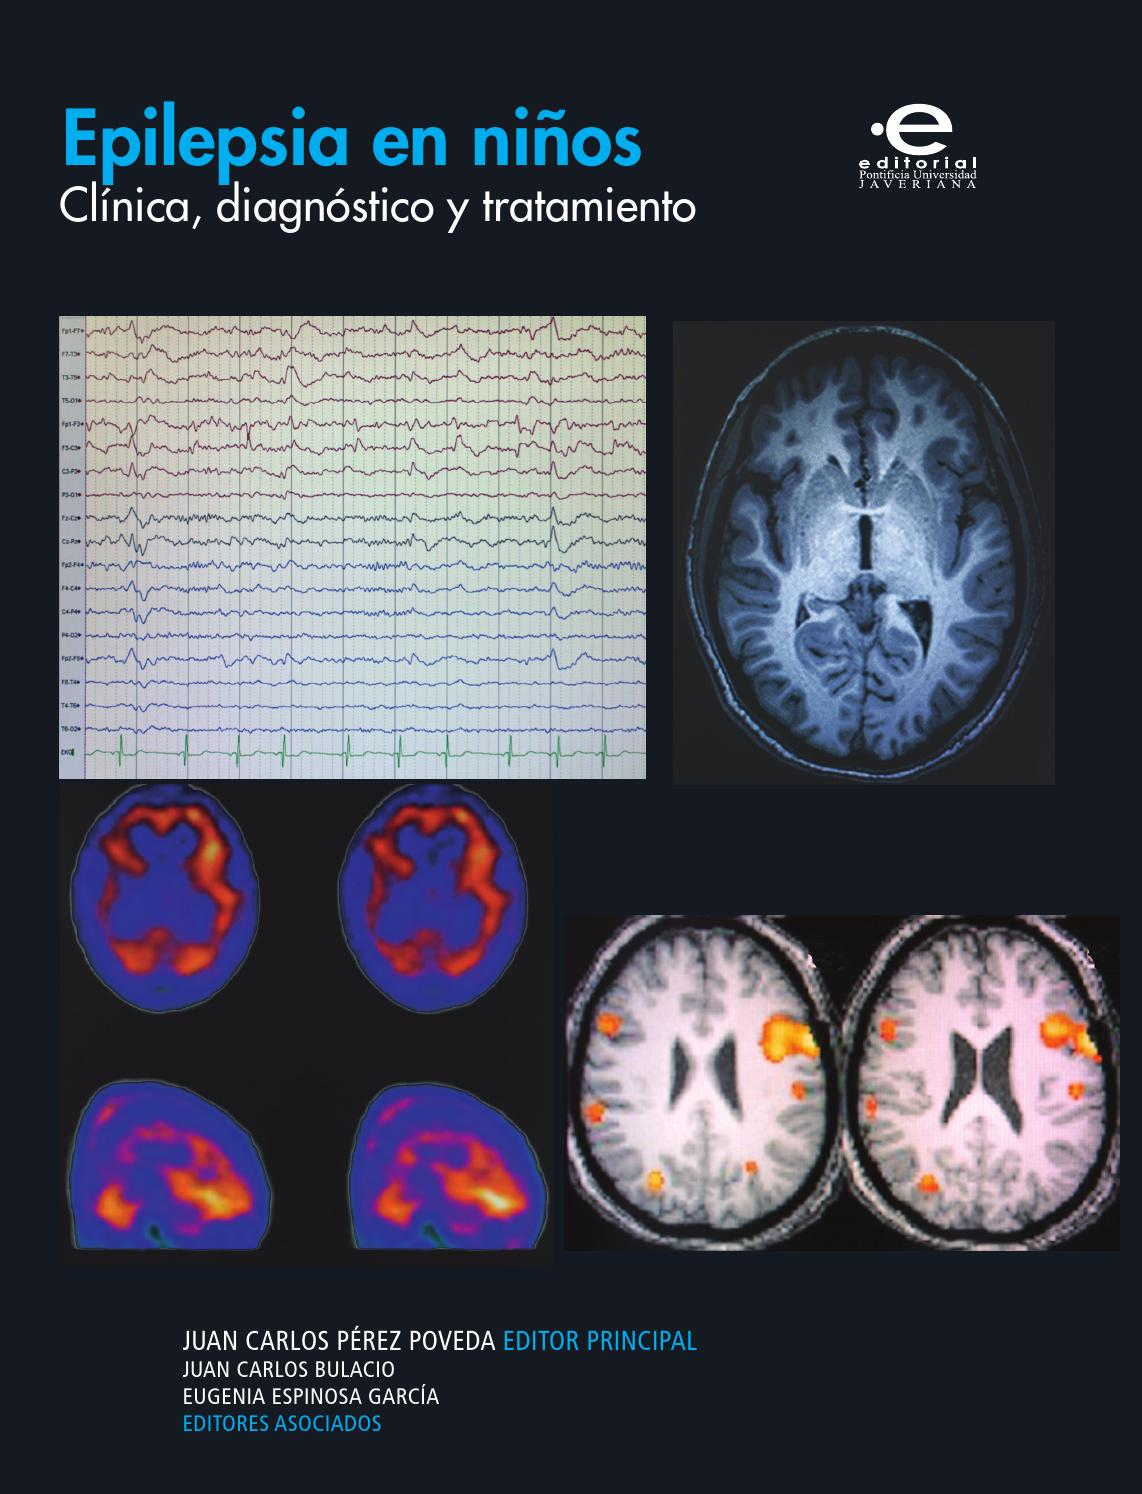 Epilepsia en niños by Editorial Pontificia Universidad Javeriana - issuu